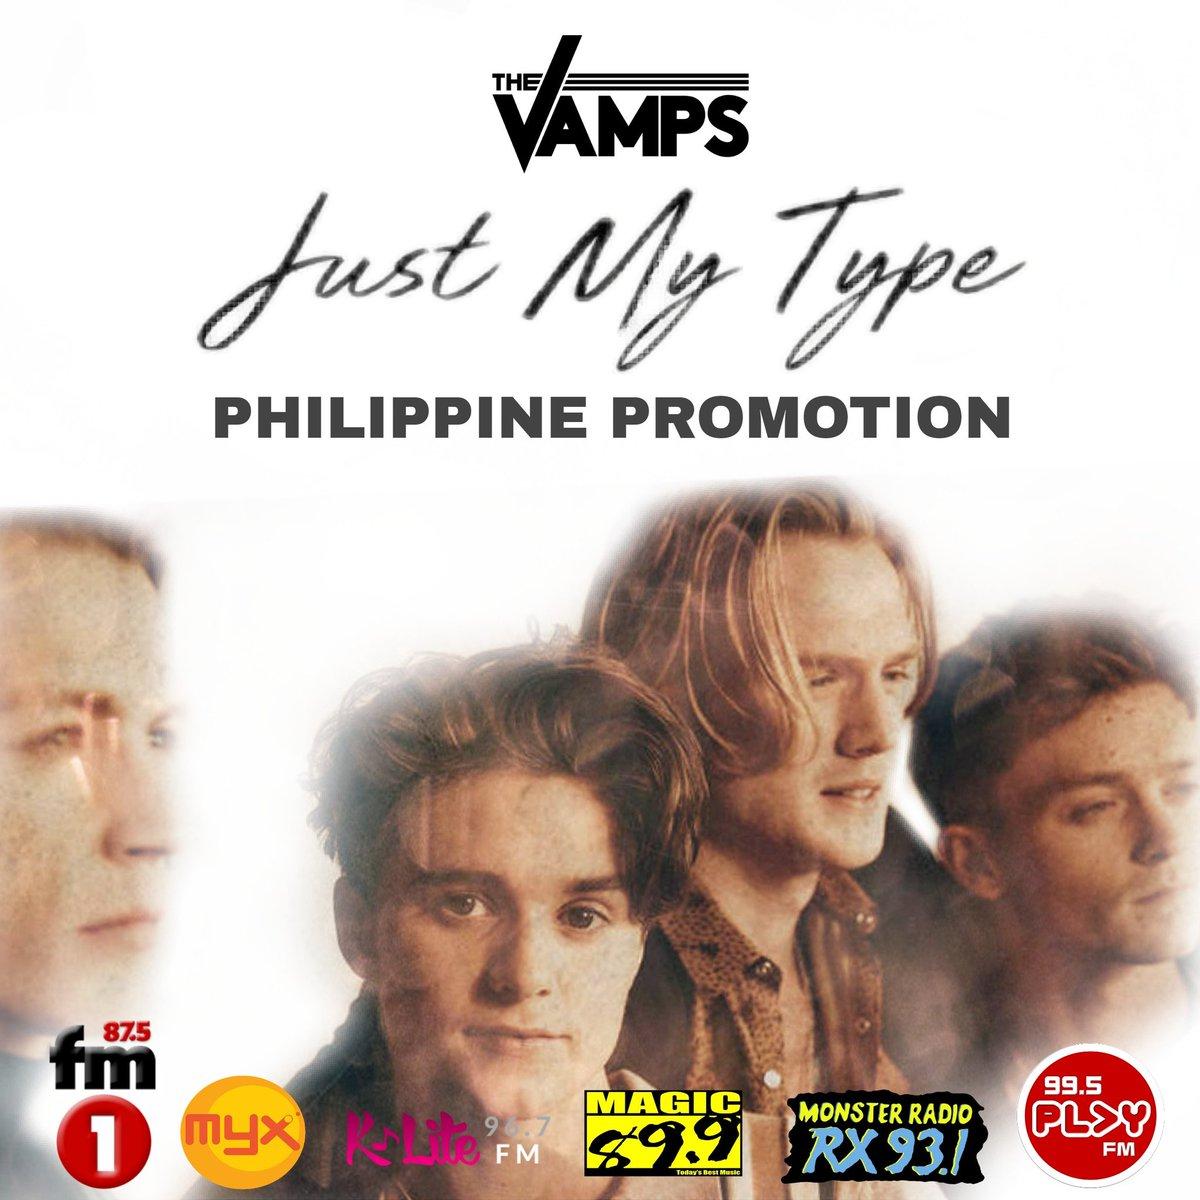 The Vamps Manila Vampsmanila Twitter